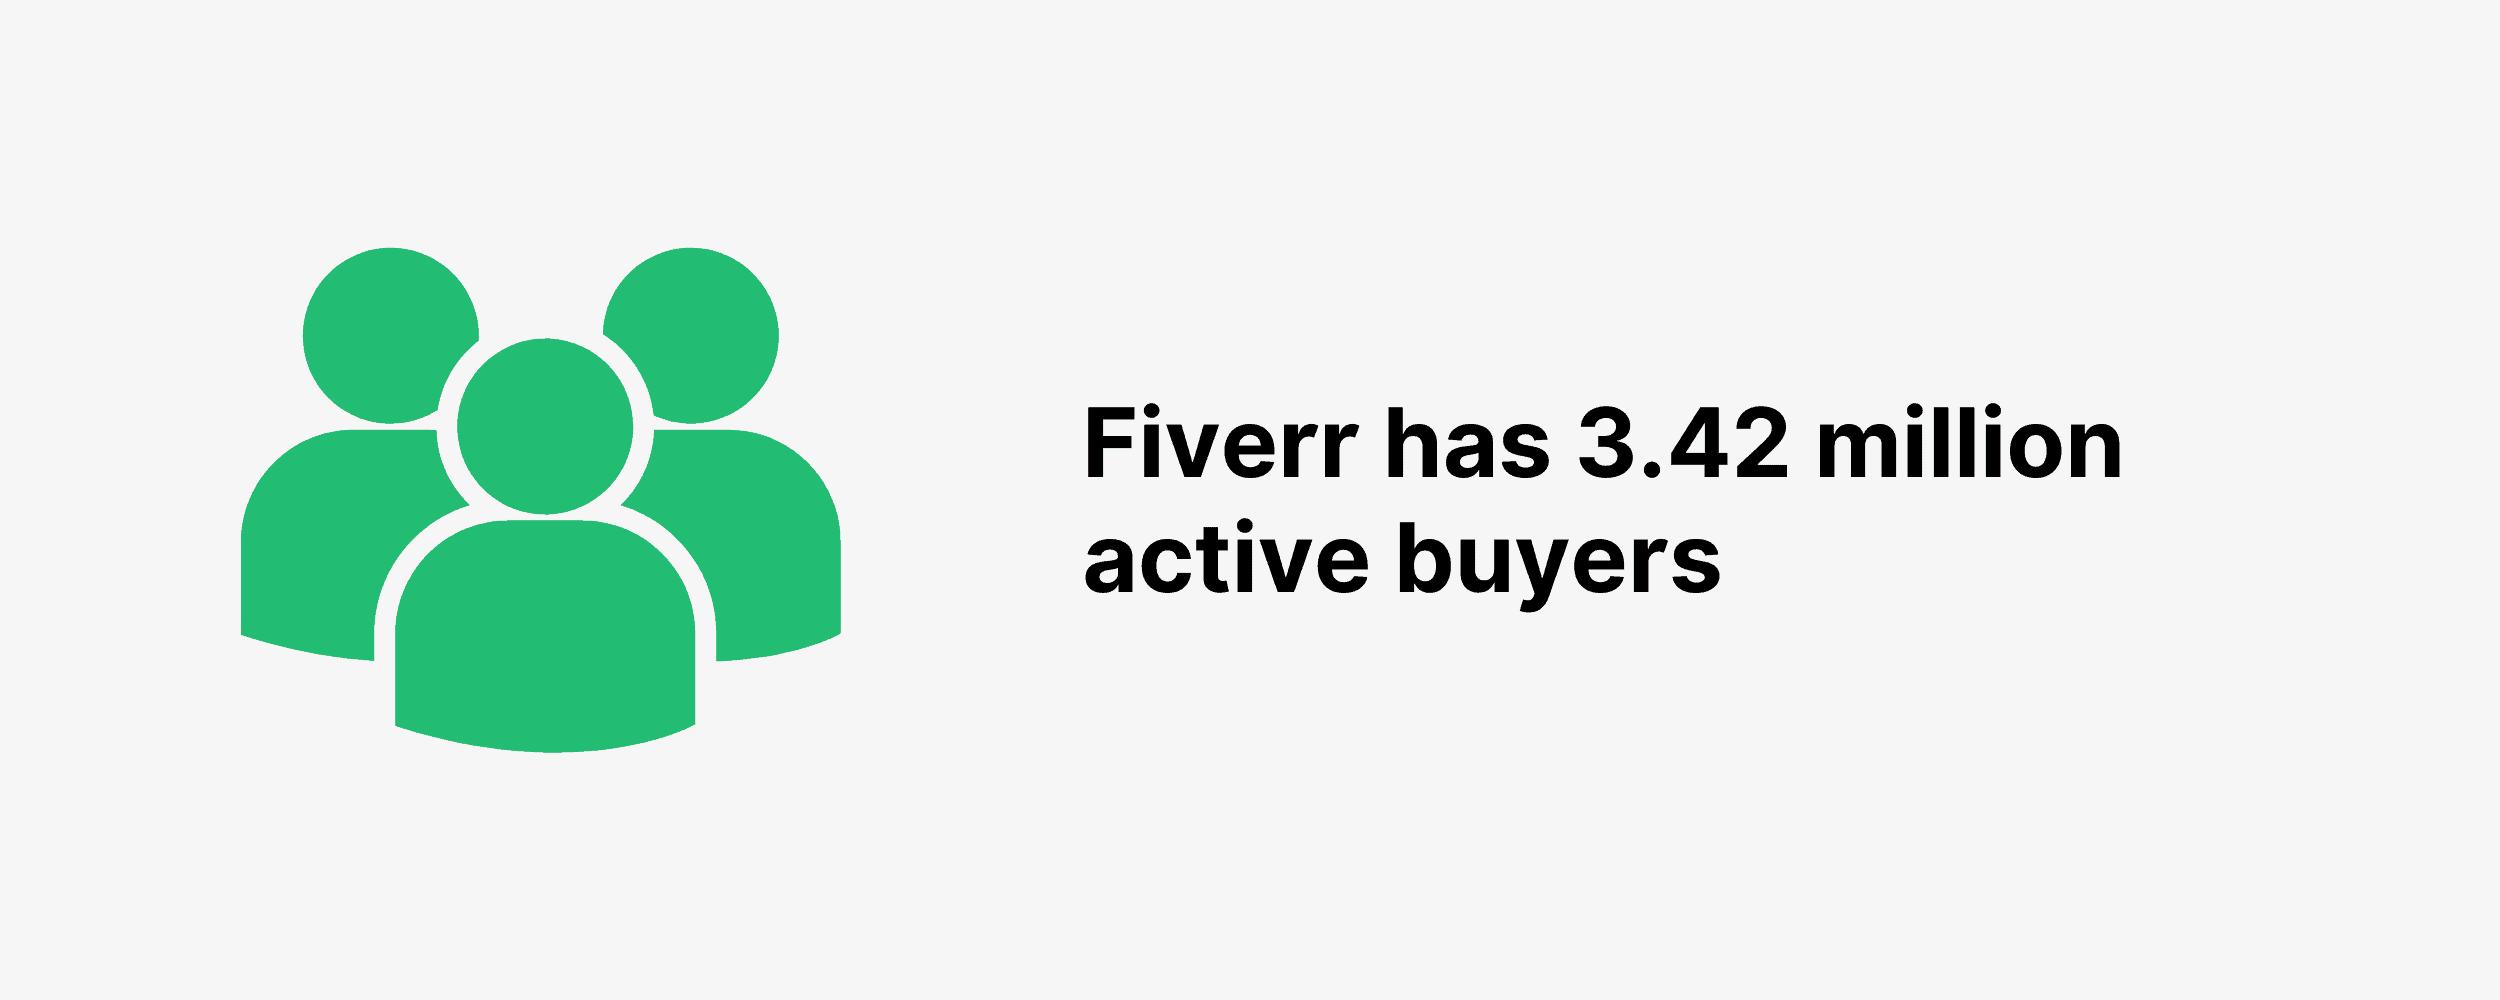 Fiverr has 3.42 million active buyers